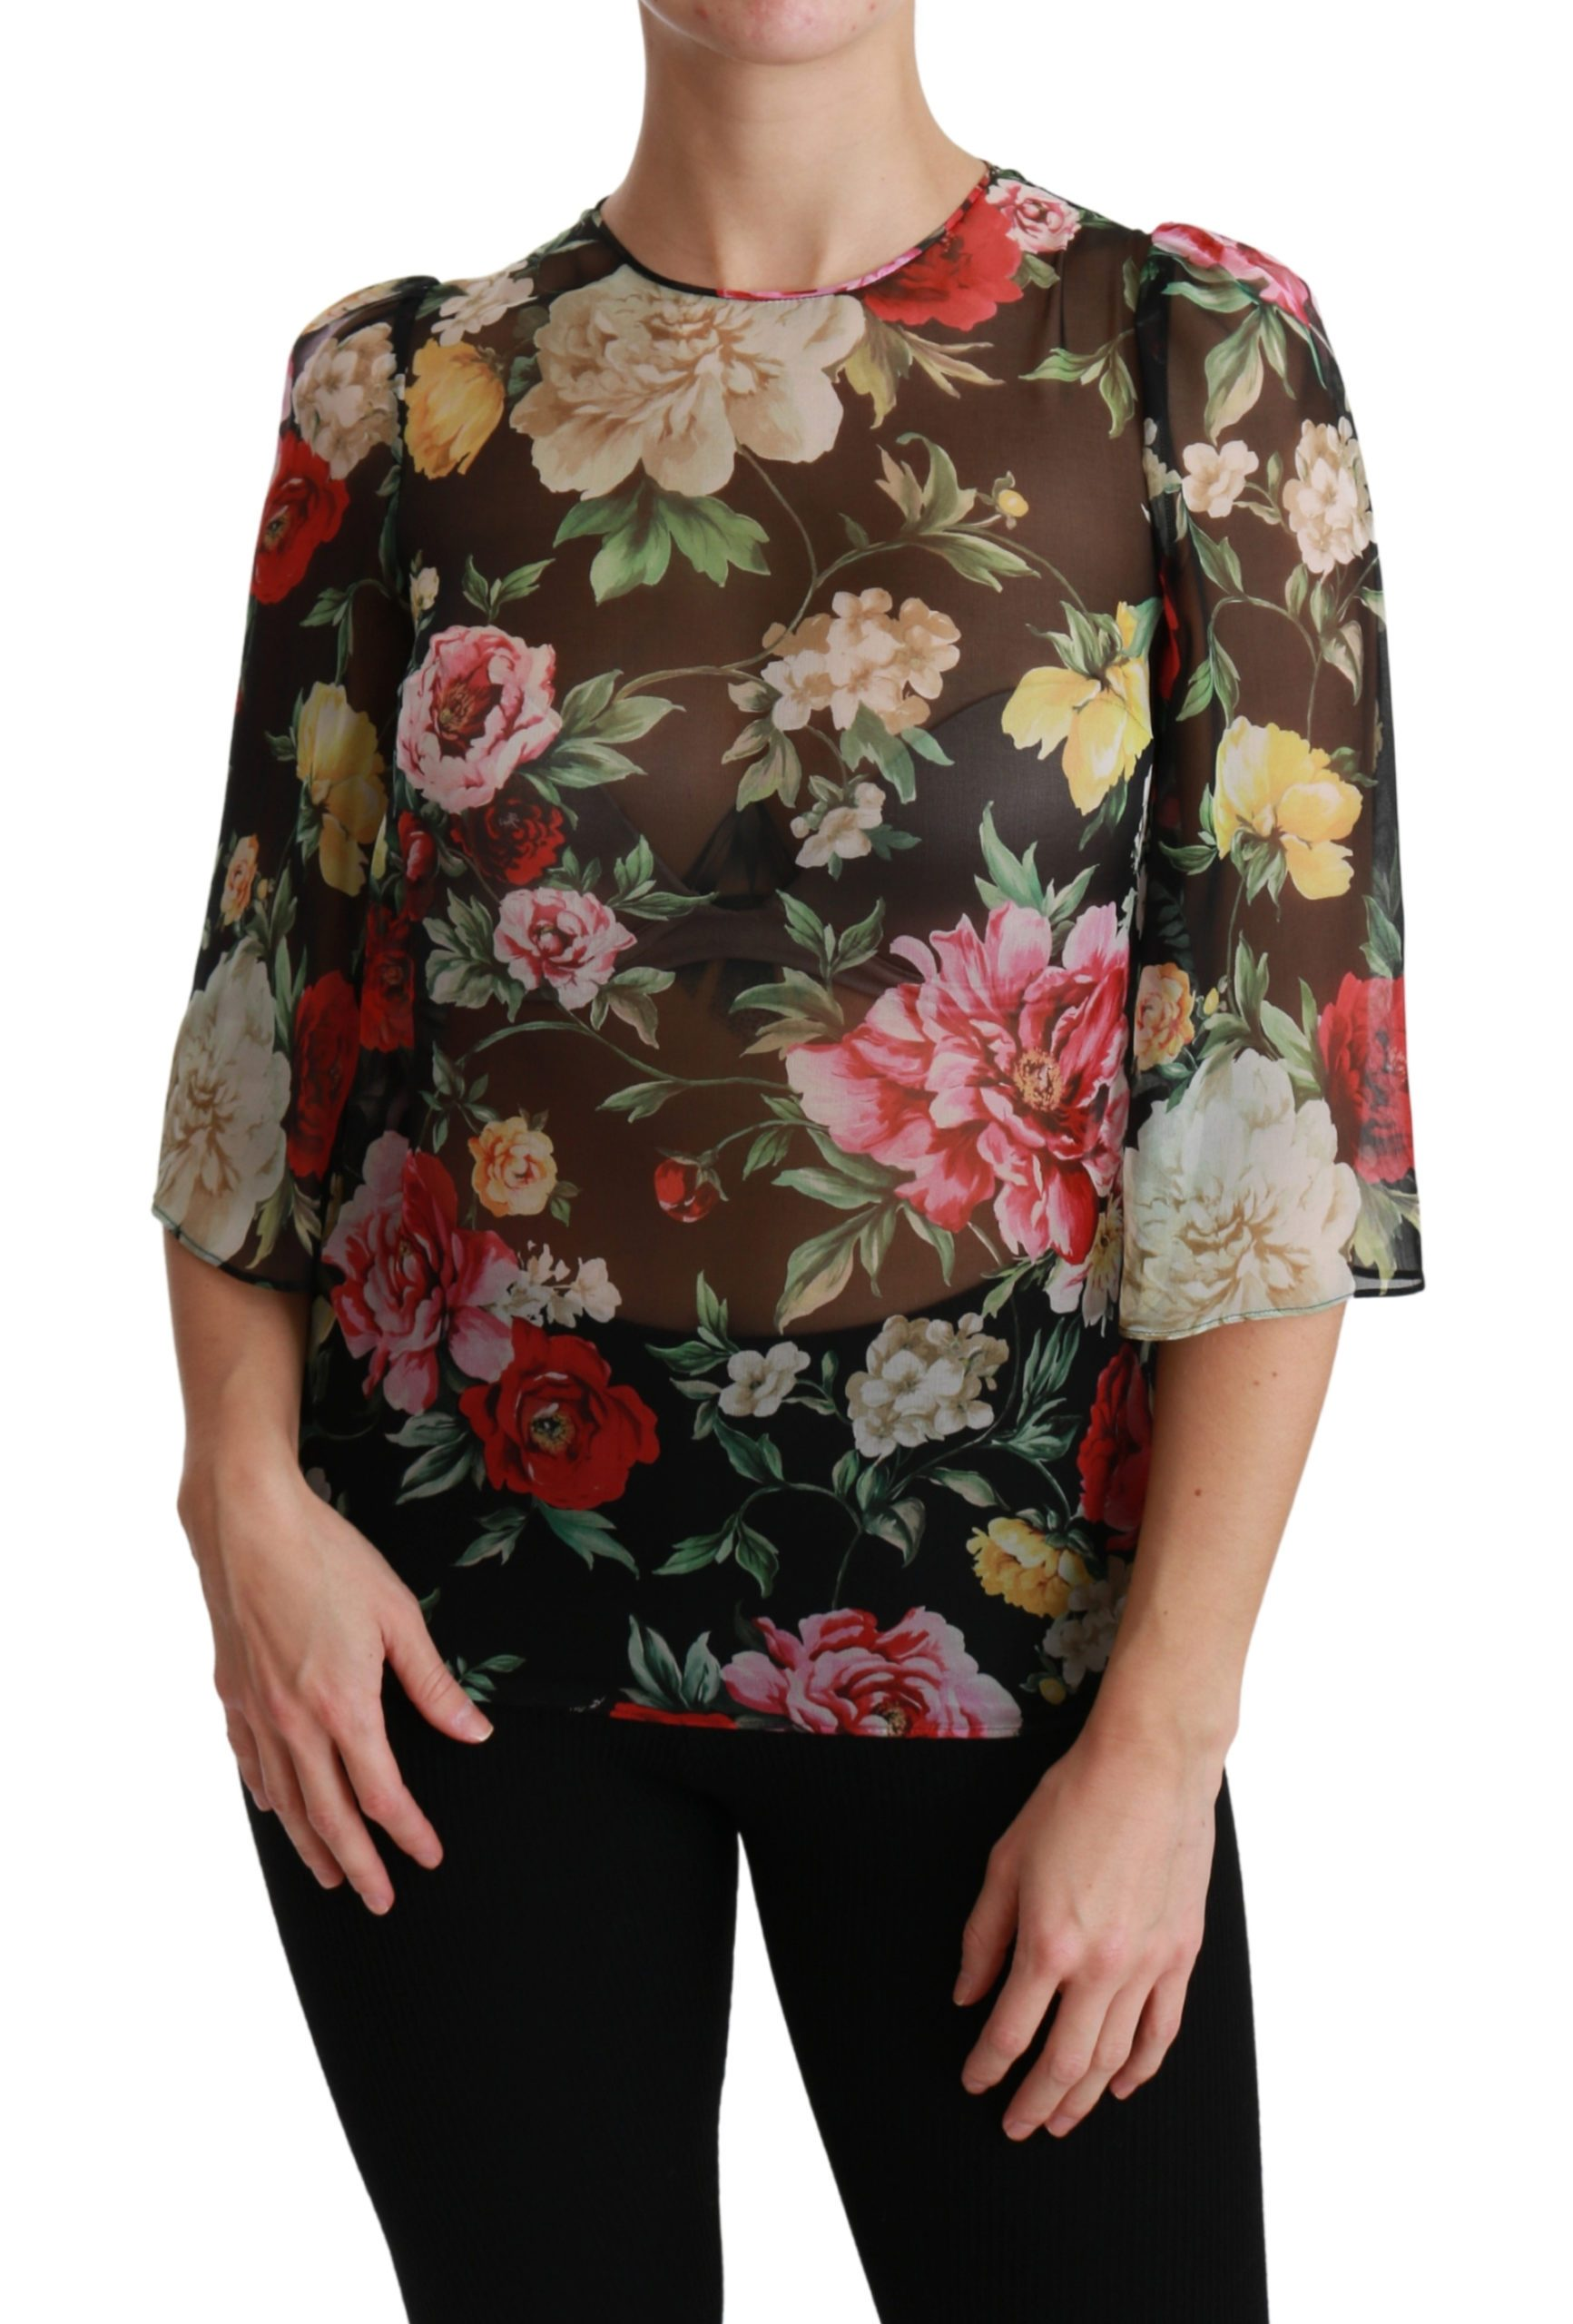 Dolce & Gabbana Women's Floral Sleeve Silk Top Black TSH4474 - IT36   XS